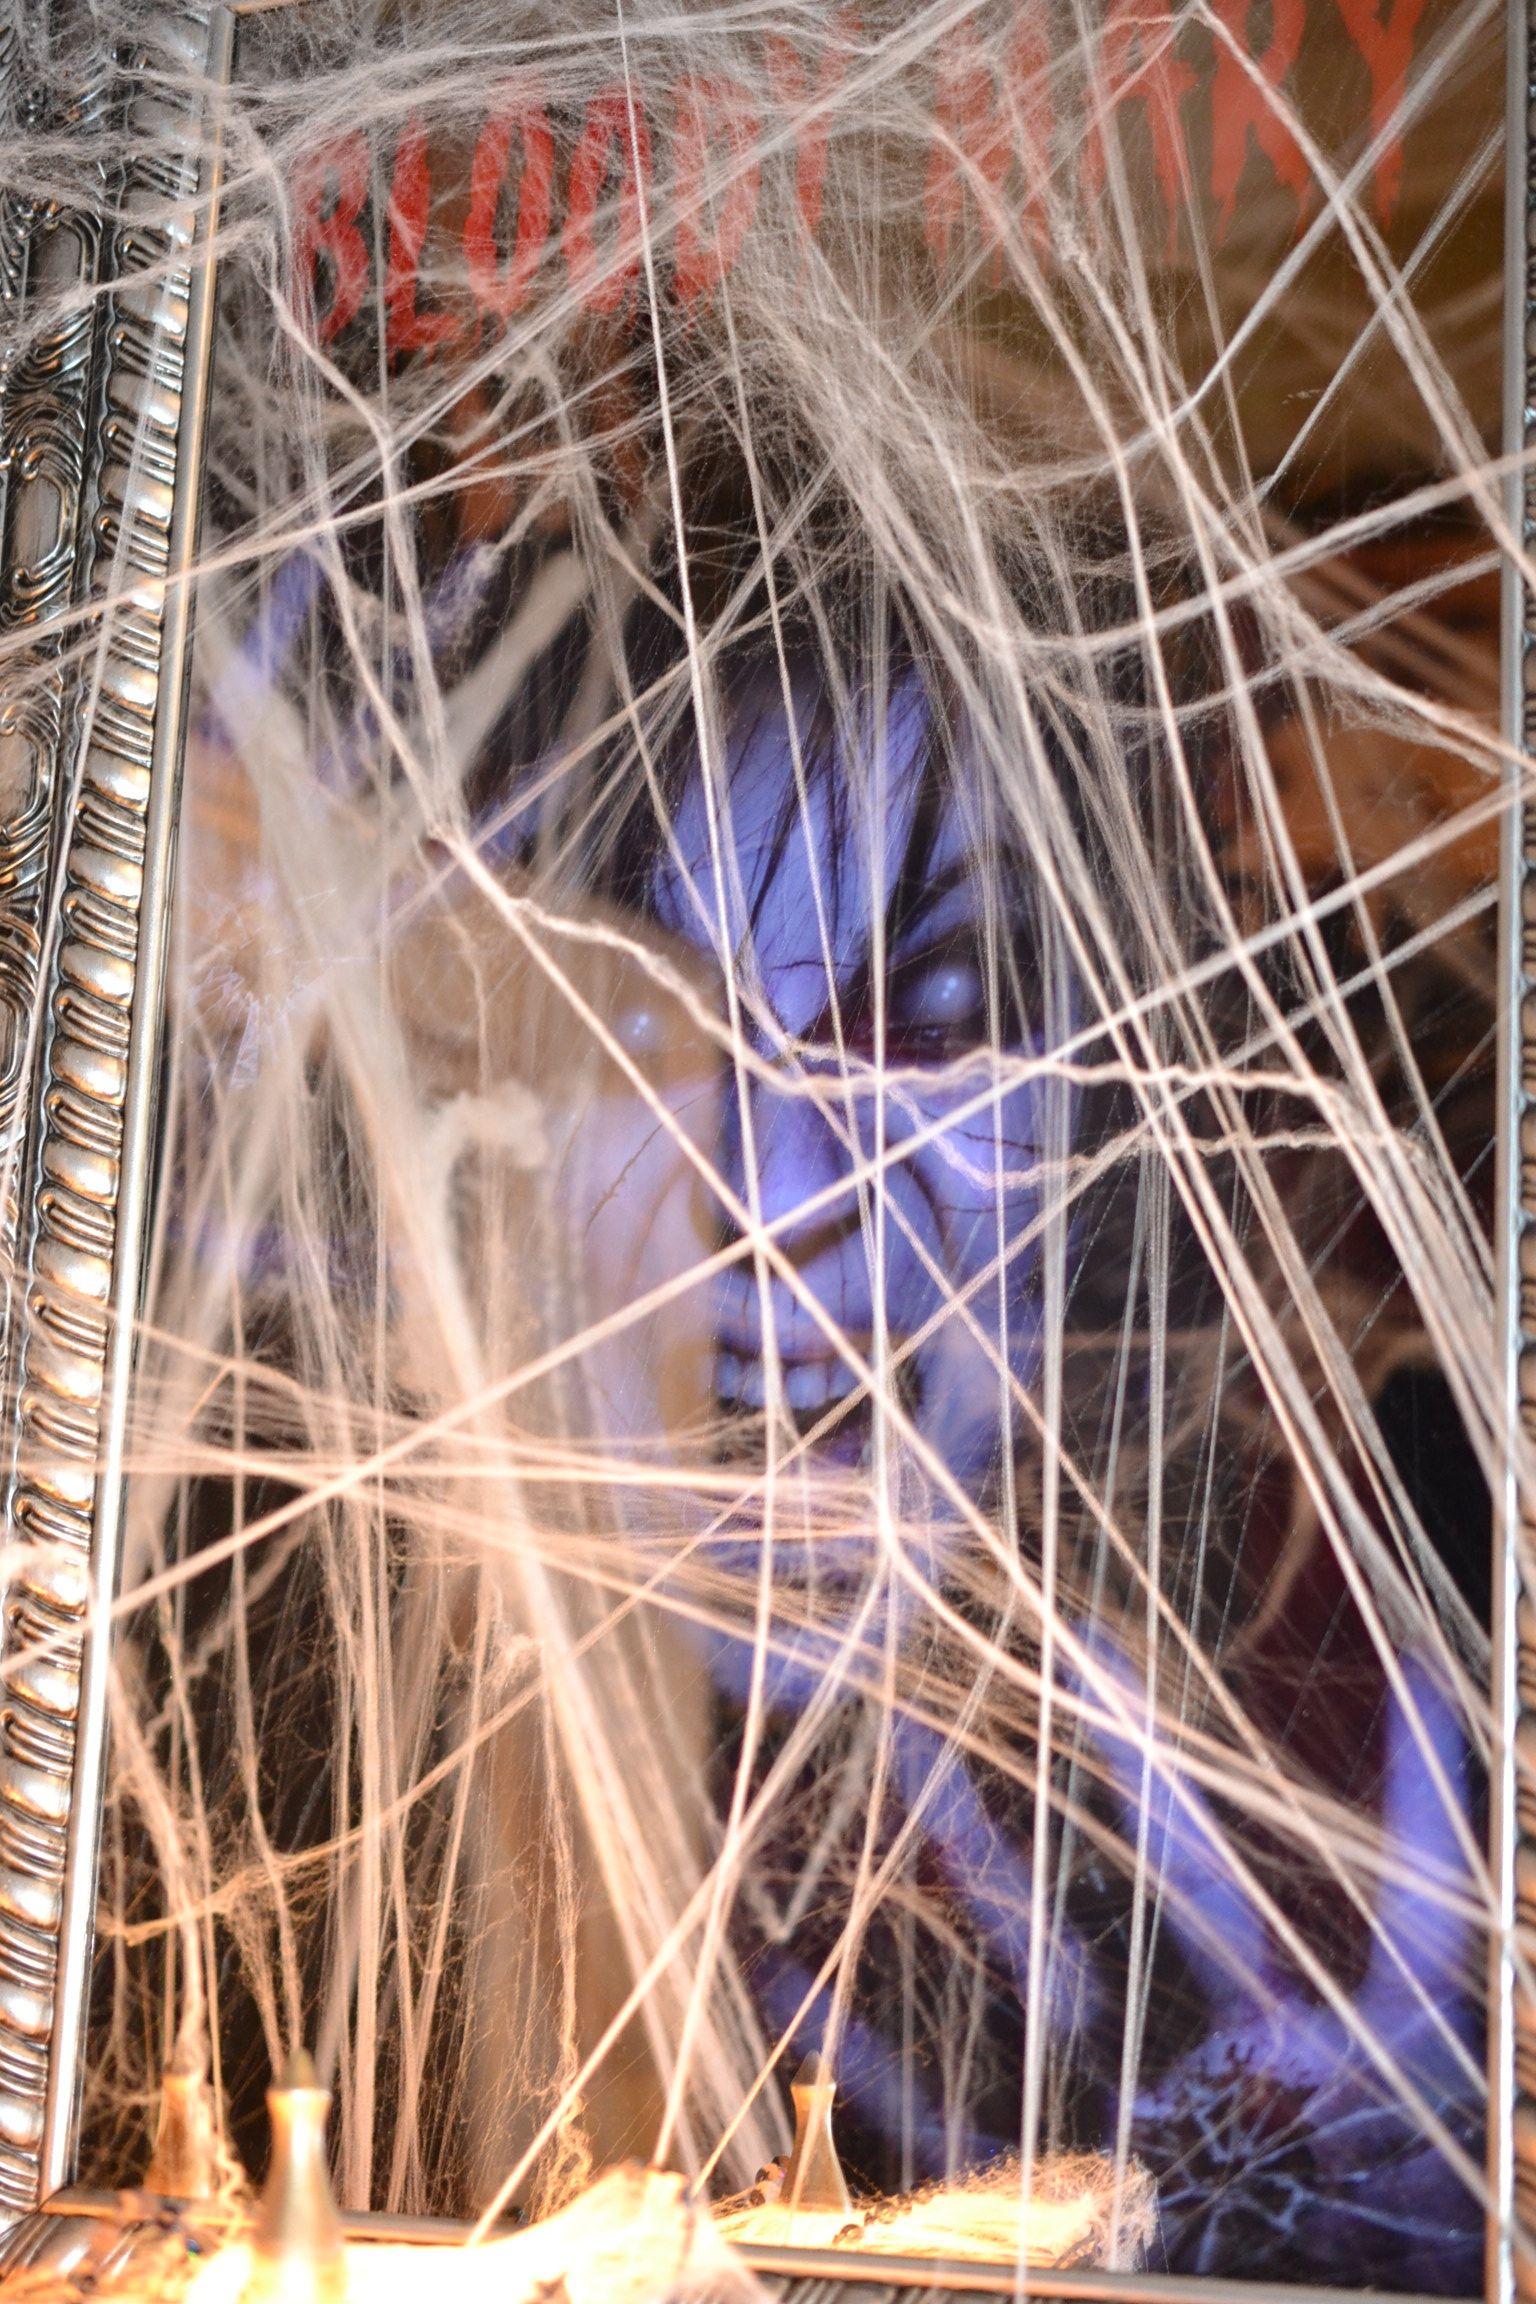 Spirit Halloween Bloody Mary Mirror Behind The Webs - 2014